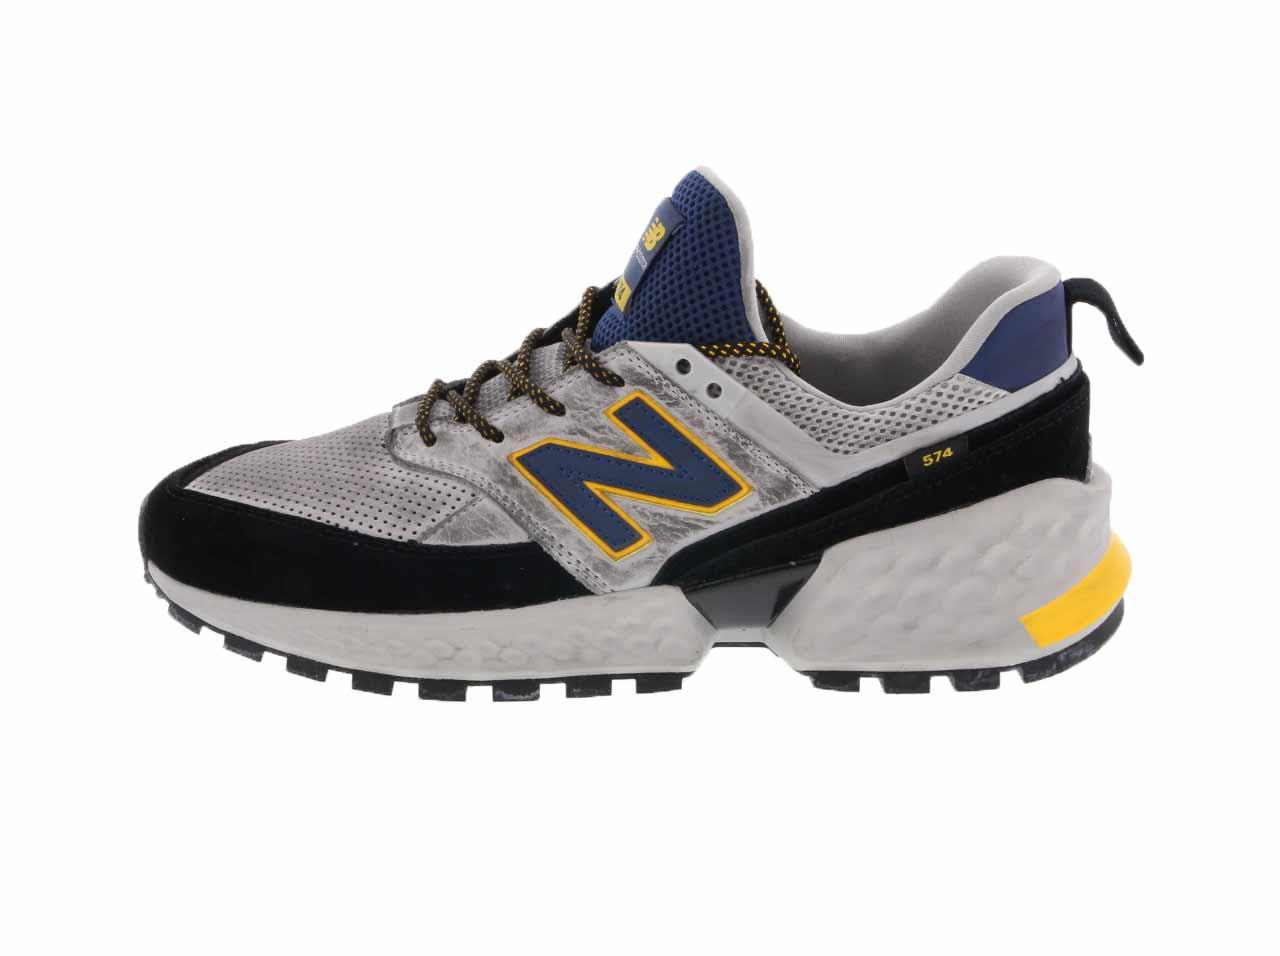 【OUTLET特価】NEWBALANCE MS574VD(MS574VD)【ニューバランスMS574 VD】【メンズファッション】【シューズ】【スニーカー】【靴】【フットウェア】